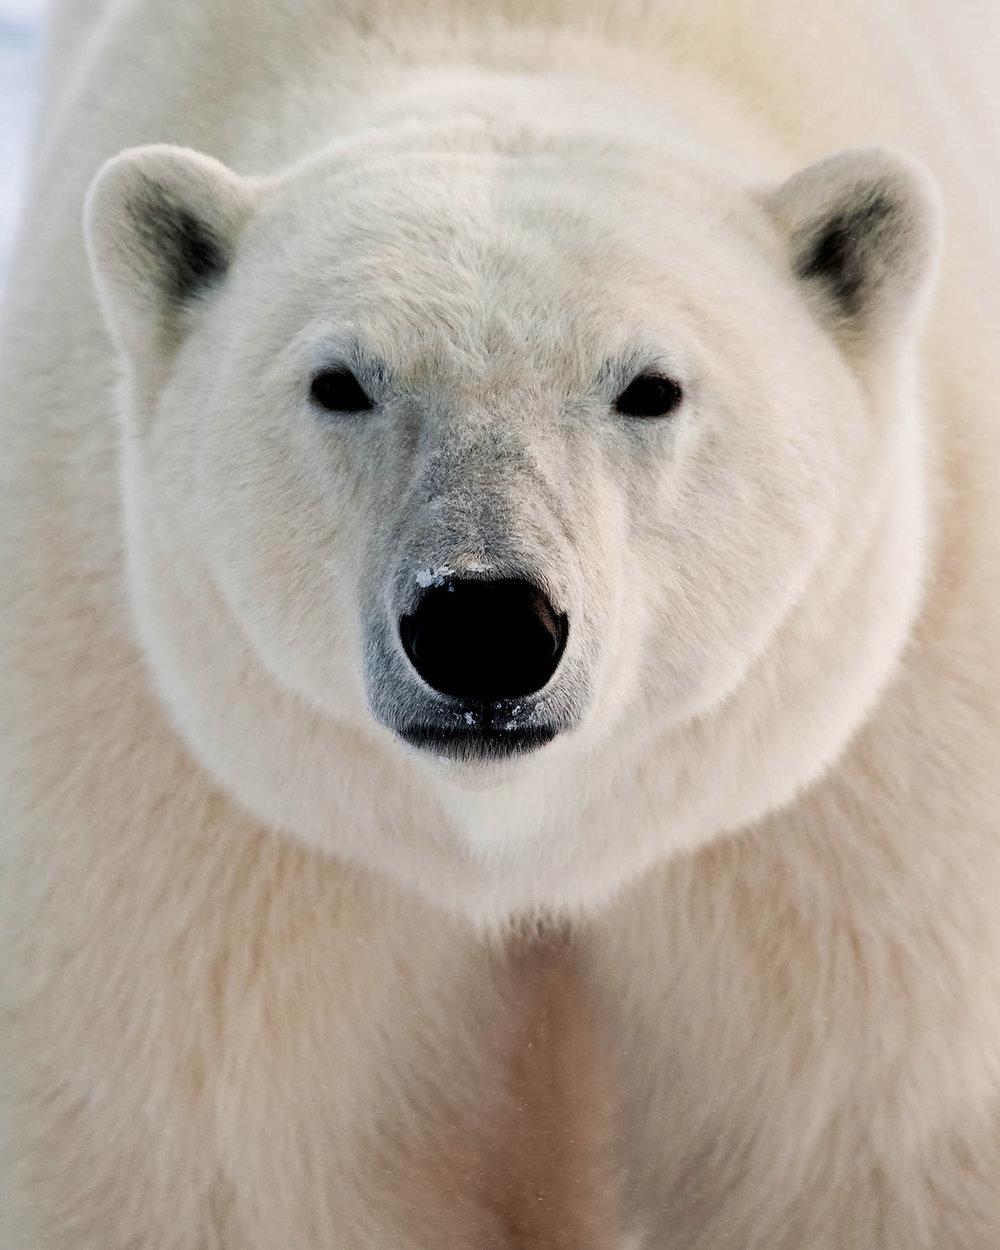 MATTHEW-JORDAN-SMITH---Polar-Bear-Beauty_DSC1254.jpg